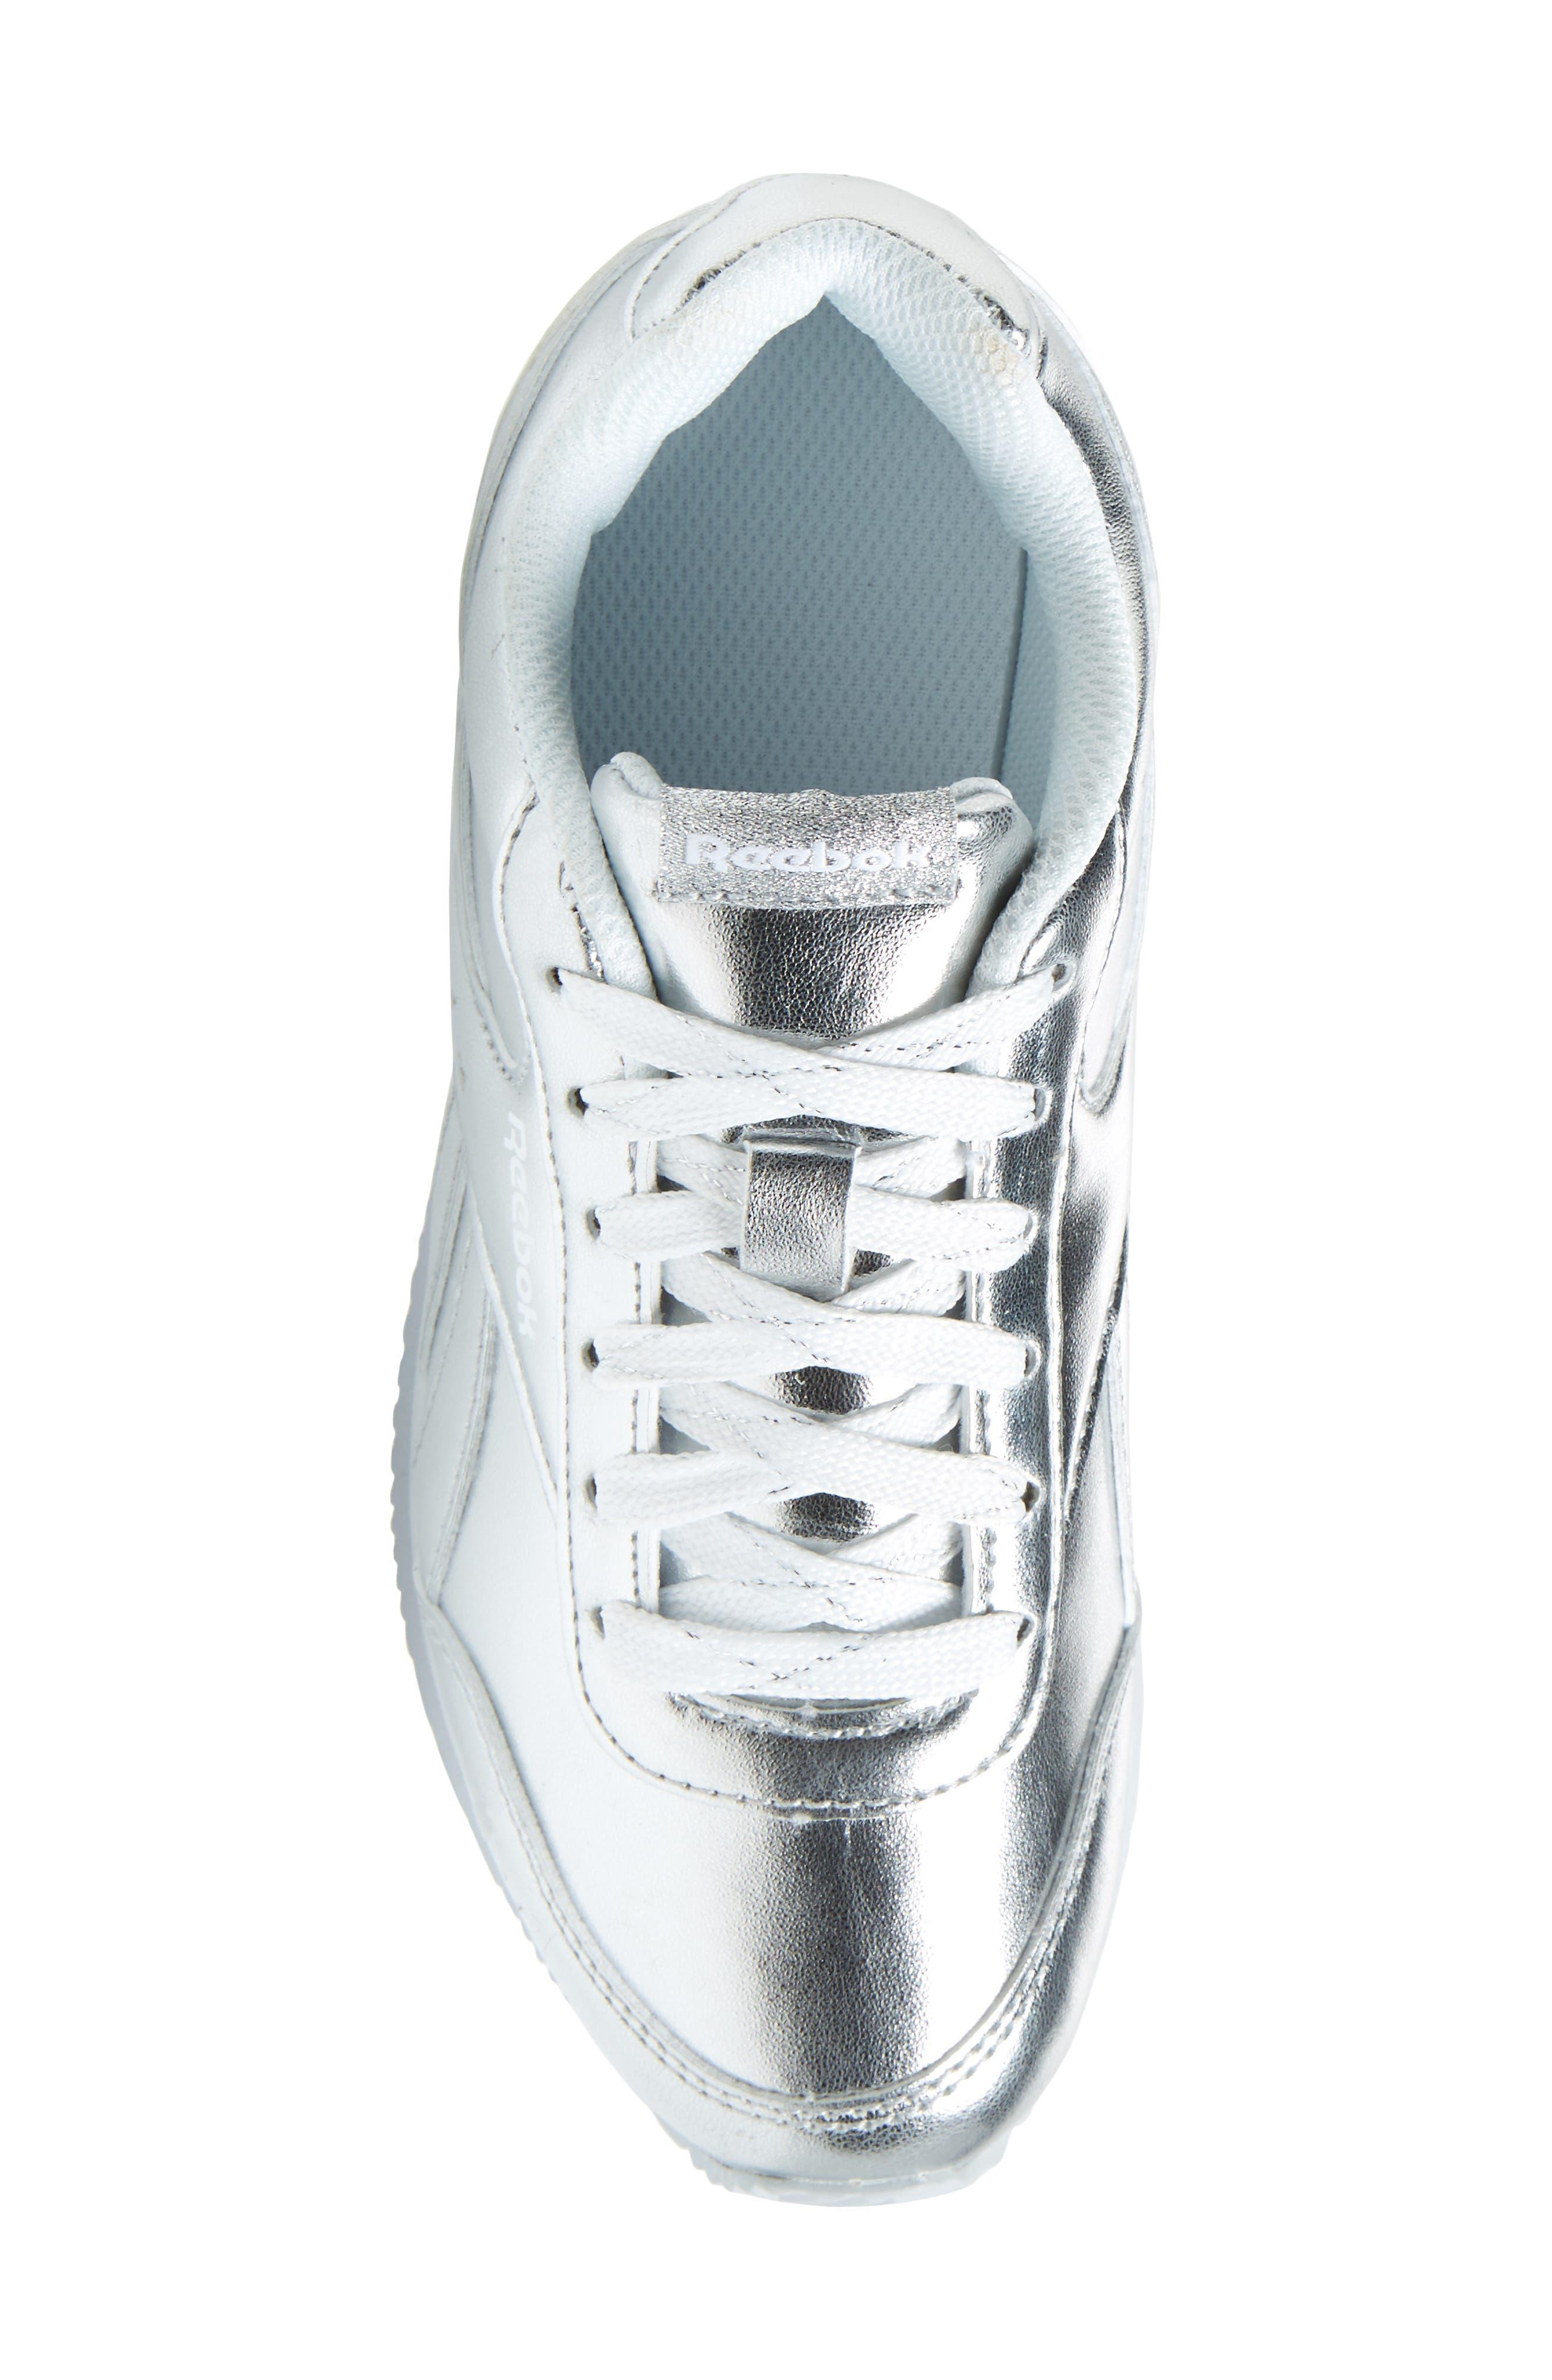 Royal Classic Jogger 2.0 Sneaker,                             Alternate thumbnail 5, color,                             Silver Metallic/ White